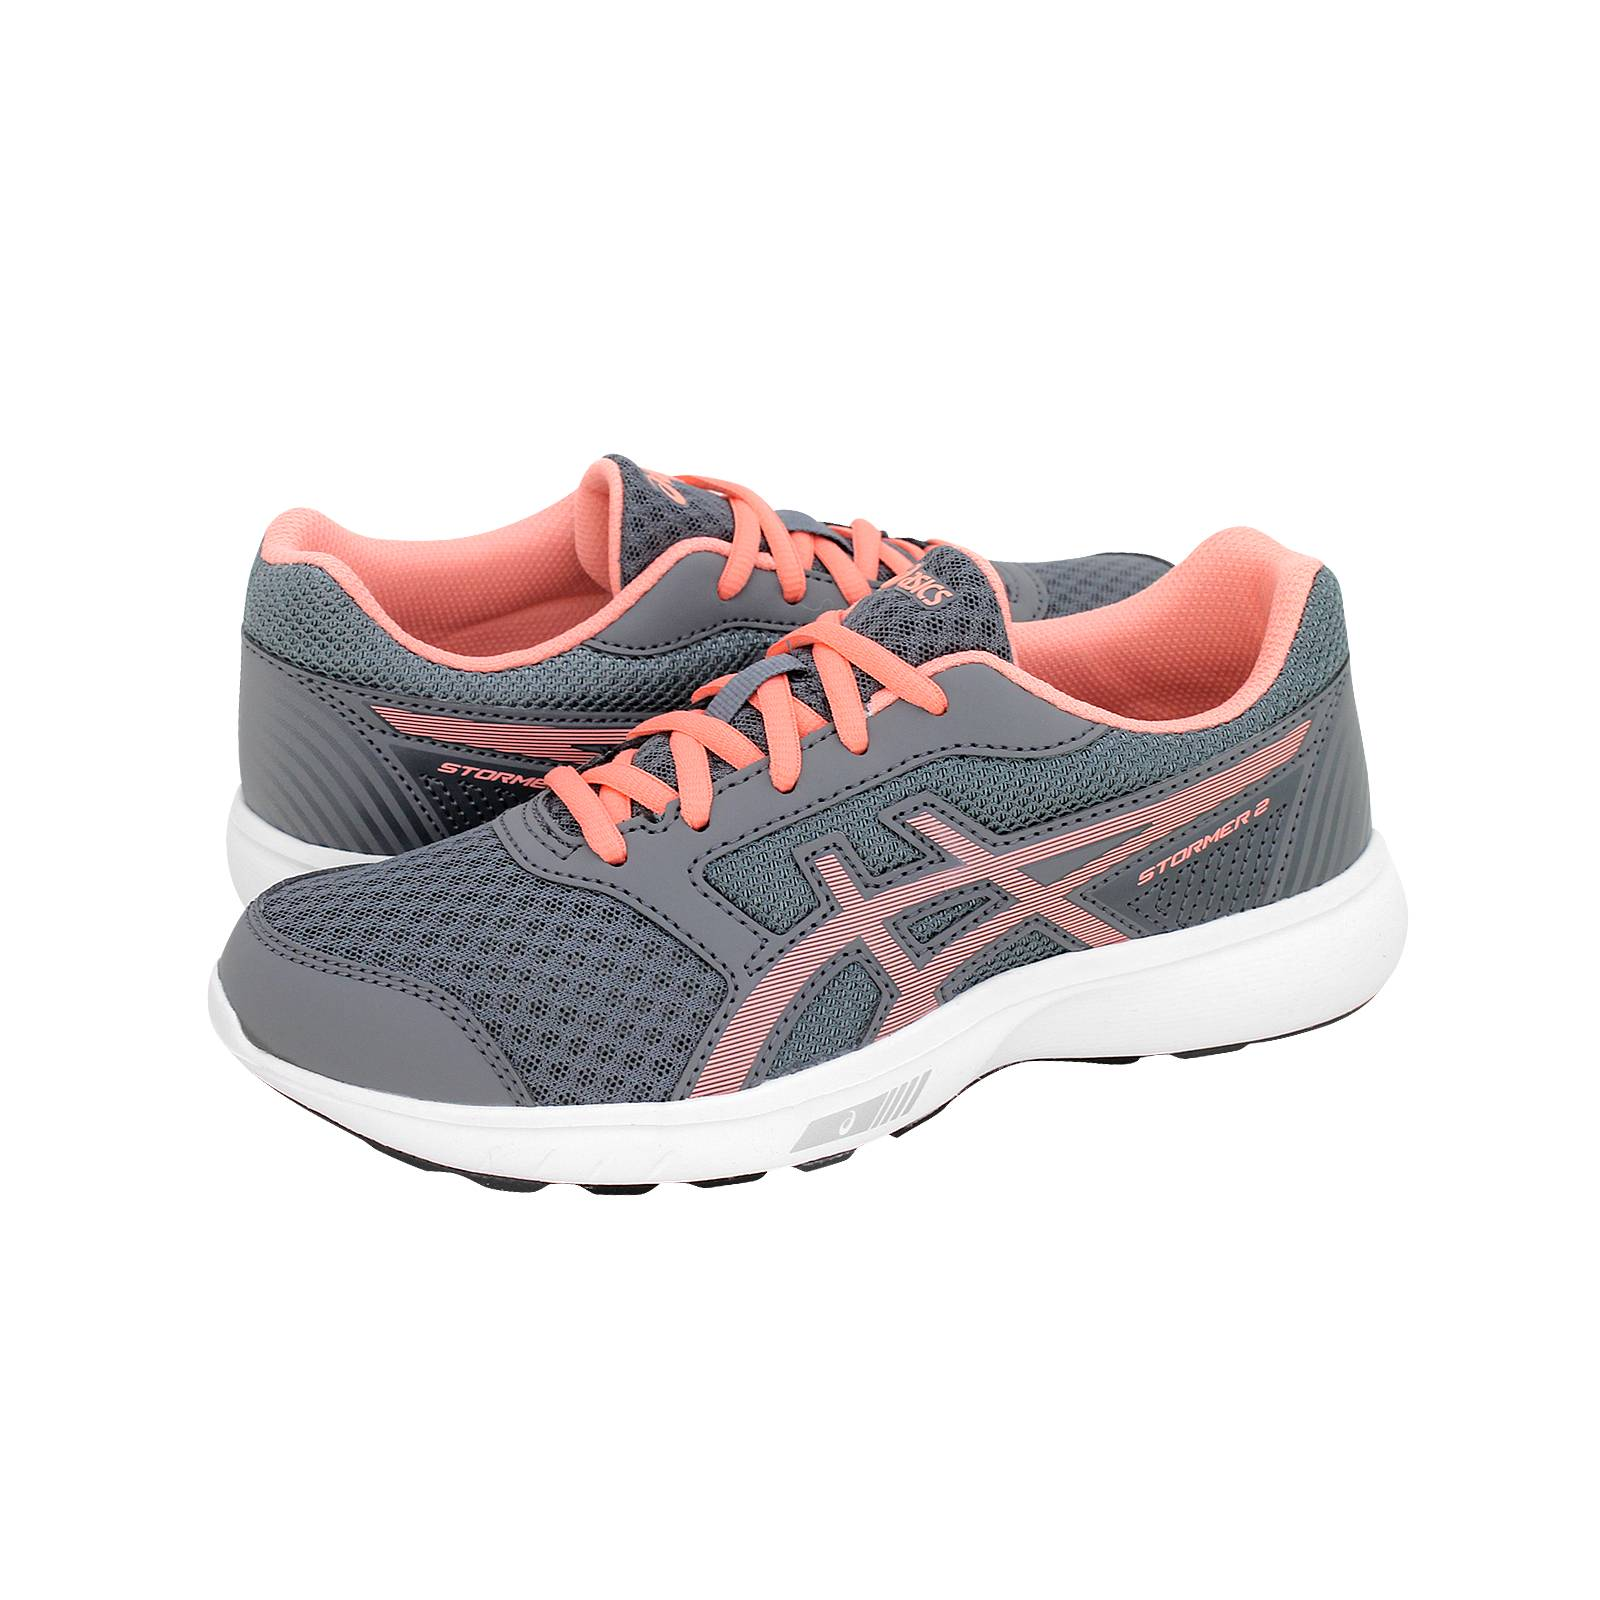 Stormer 2 GS - Παιδικά αθλητικά παπούτσια Asics από υφασμα και δερμα ... f941b46035b